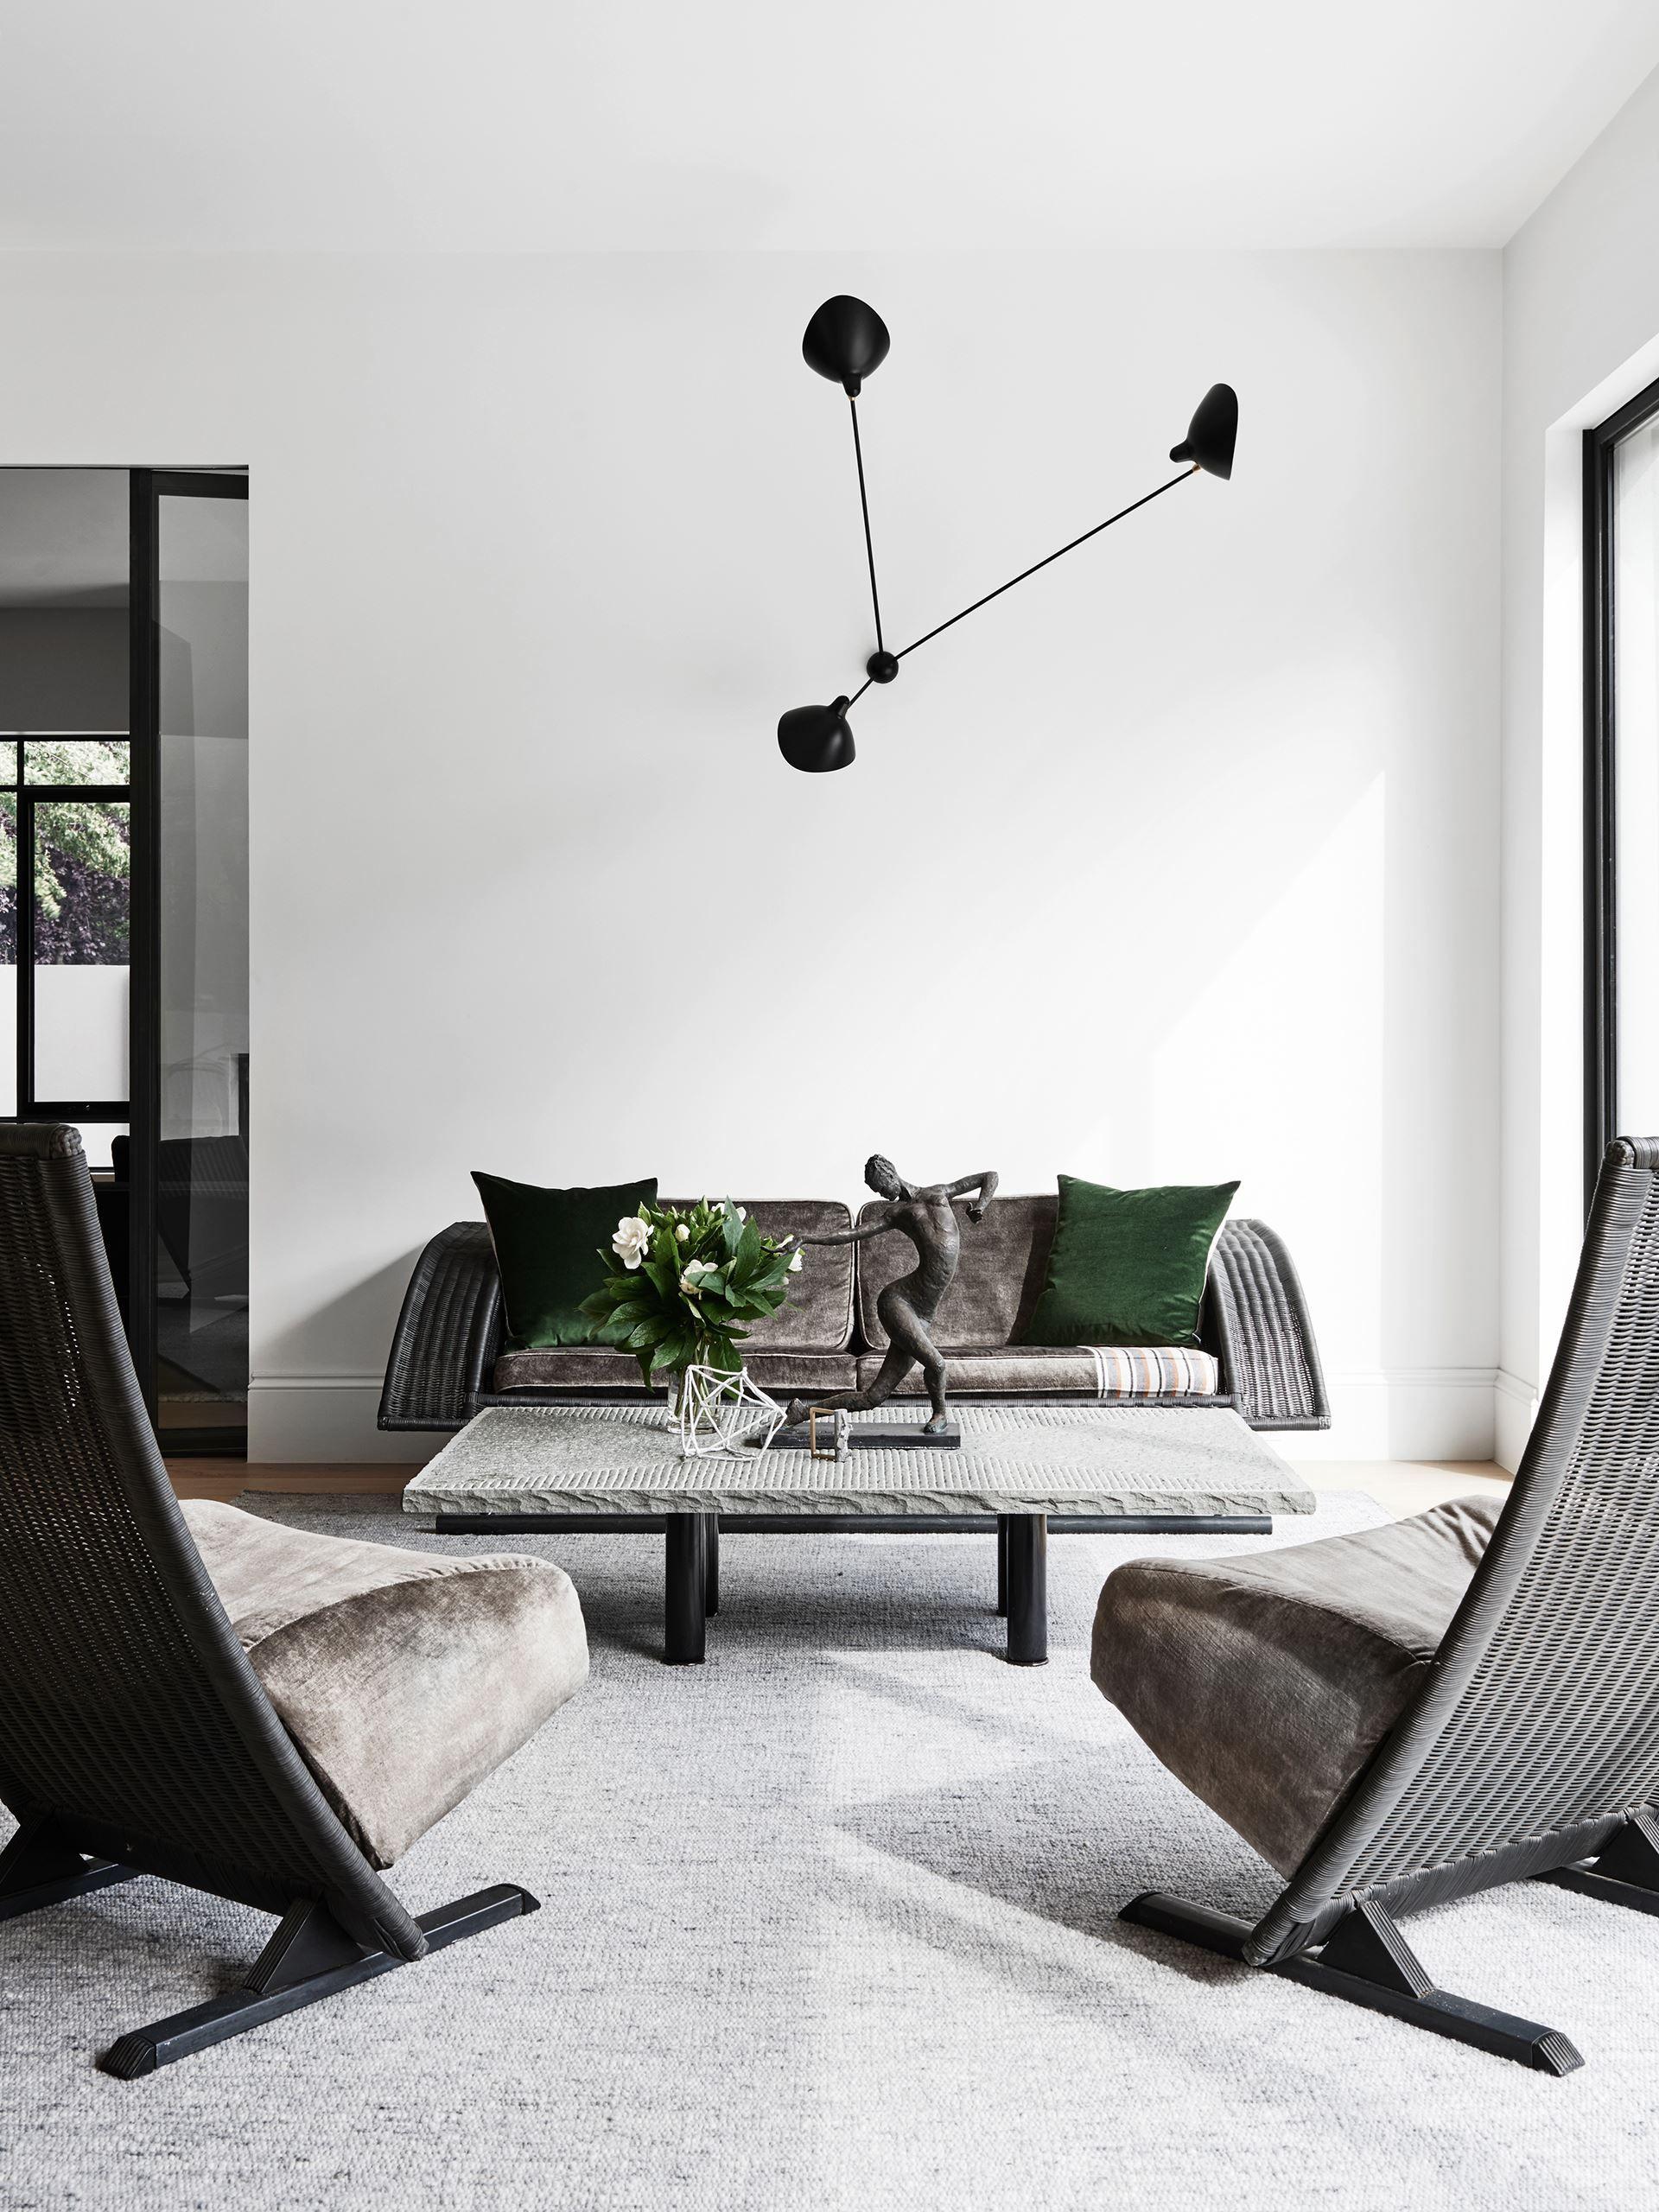 Gaudy 80s Home Gets Modern Renovation | European furniture, Wicker ...